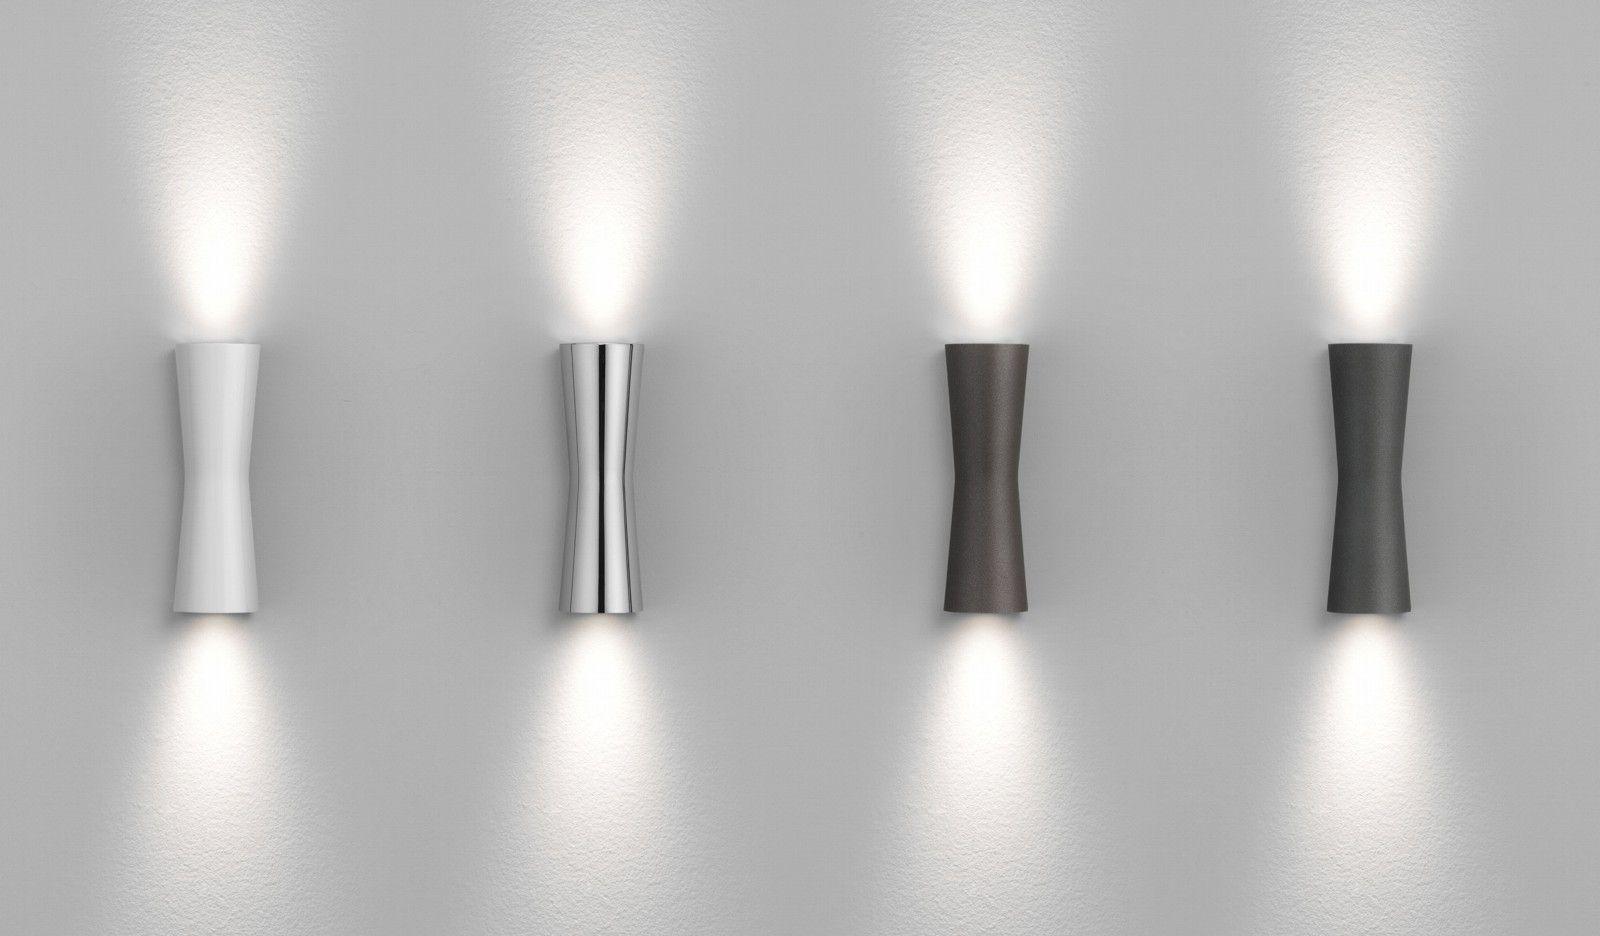 designer wall sconces lighting. Clessidra-modern-up-down-contemporary-wall-spot-light- Designer Wall Sconces Lighting L